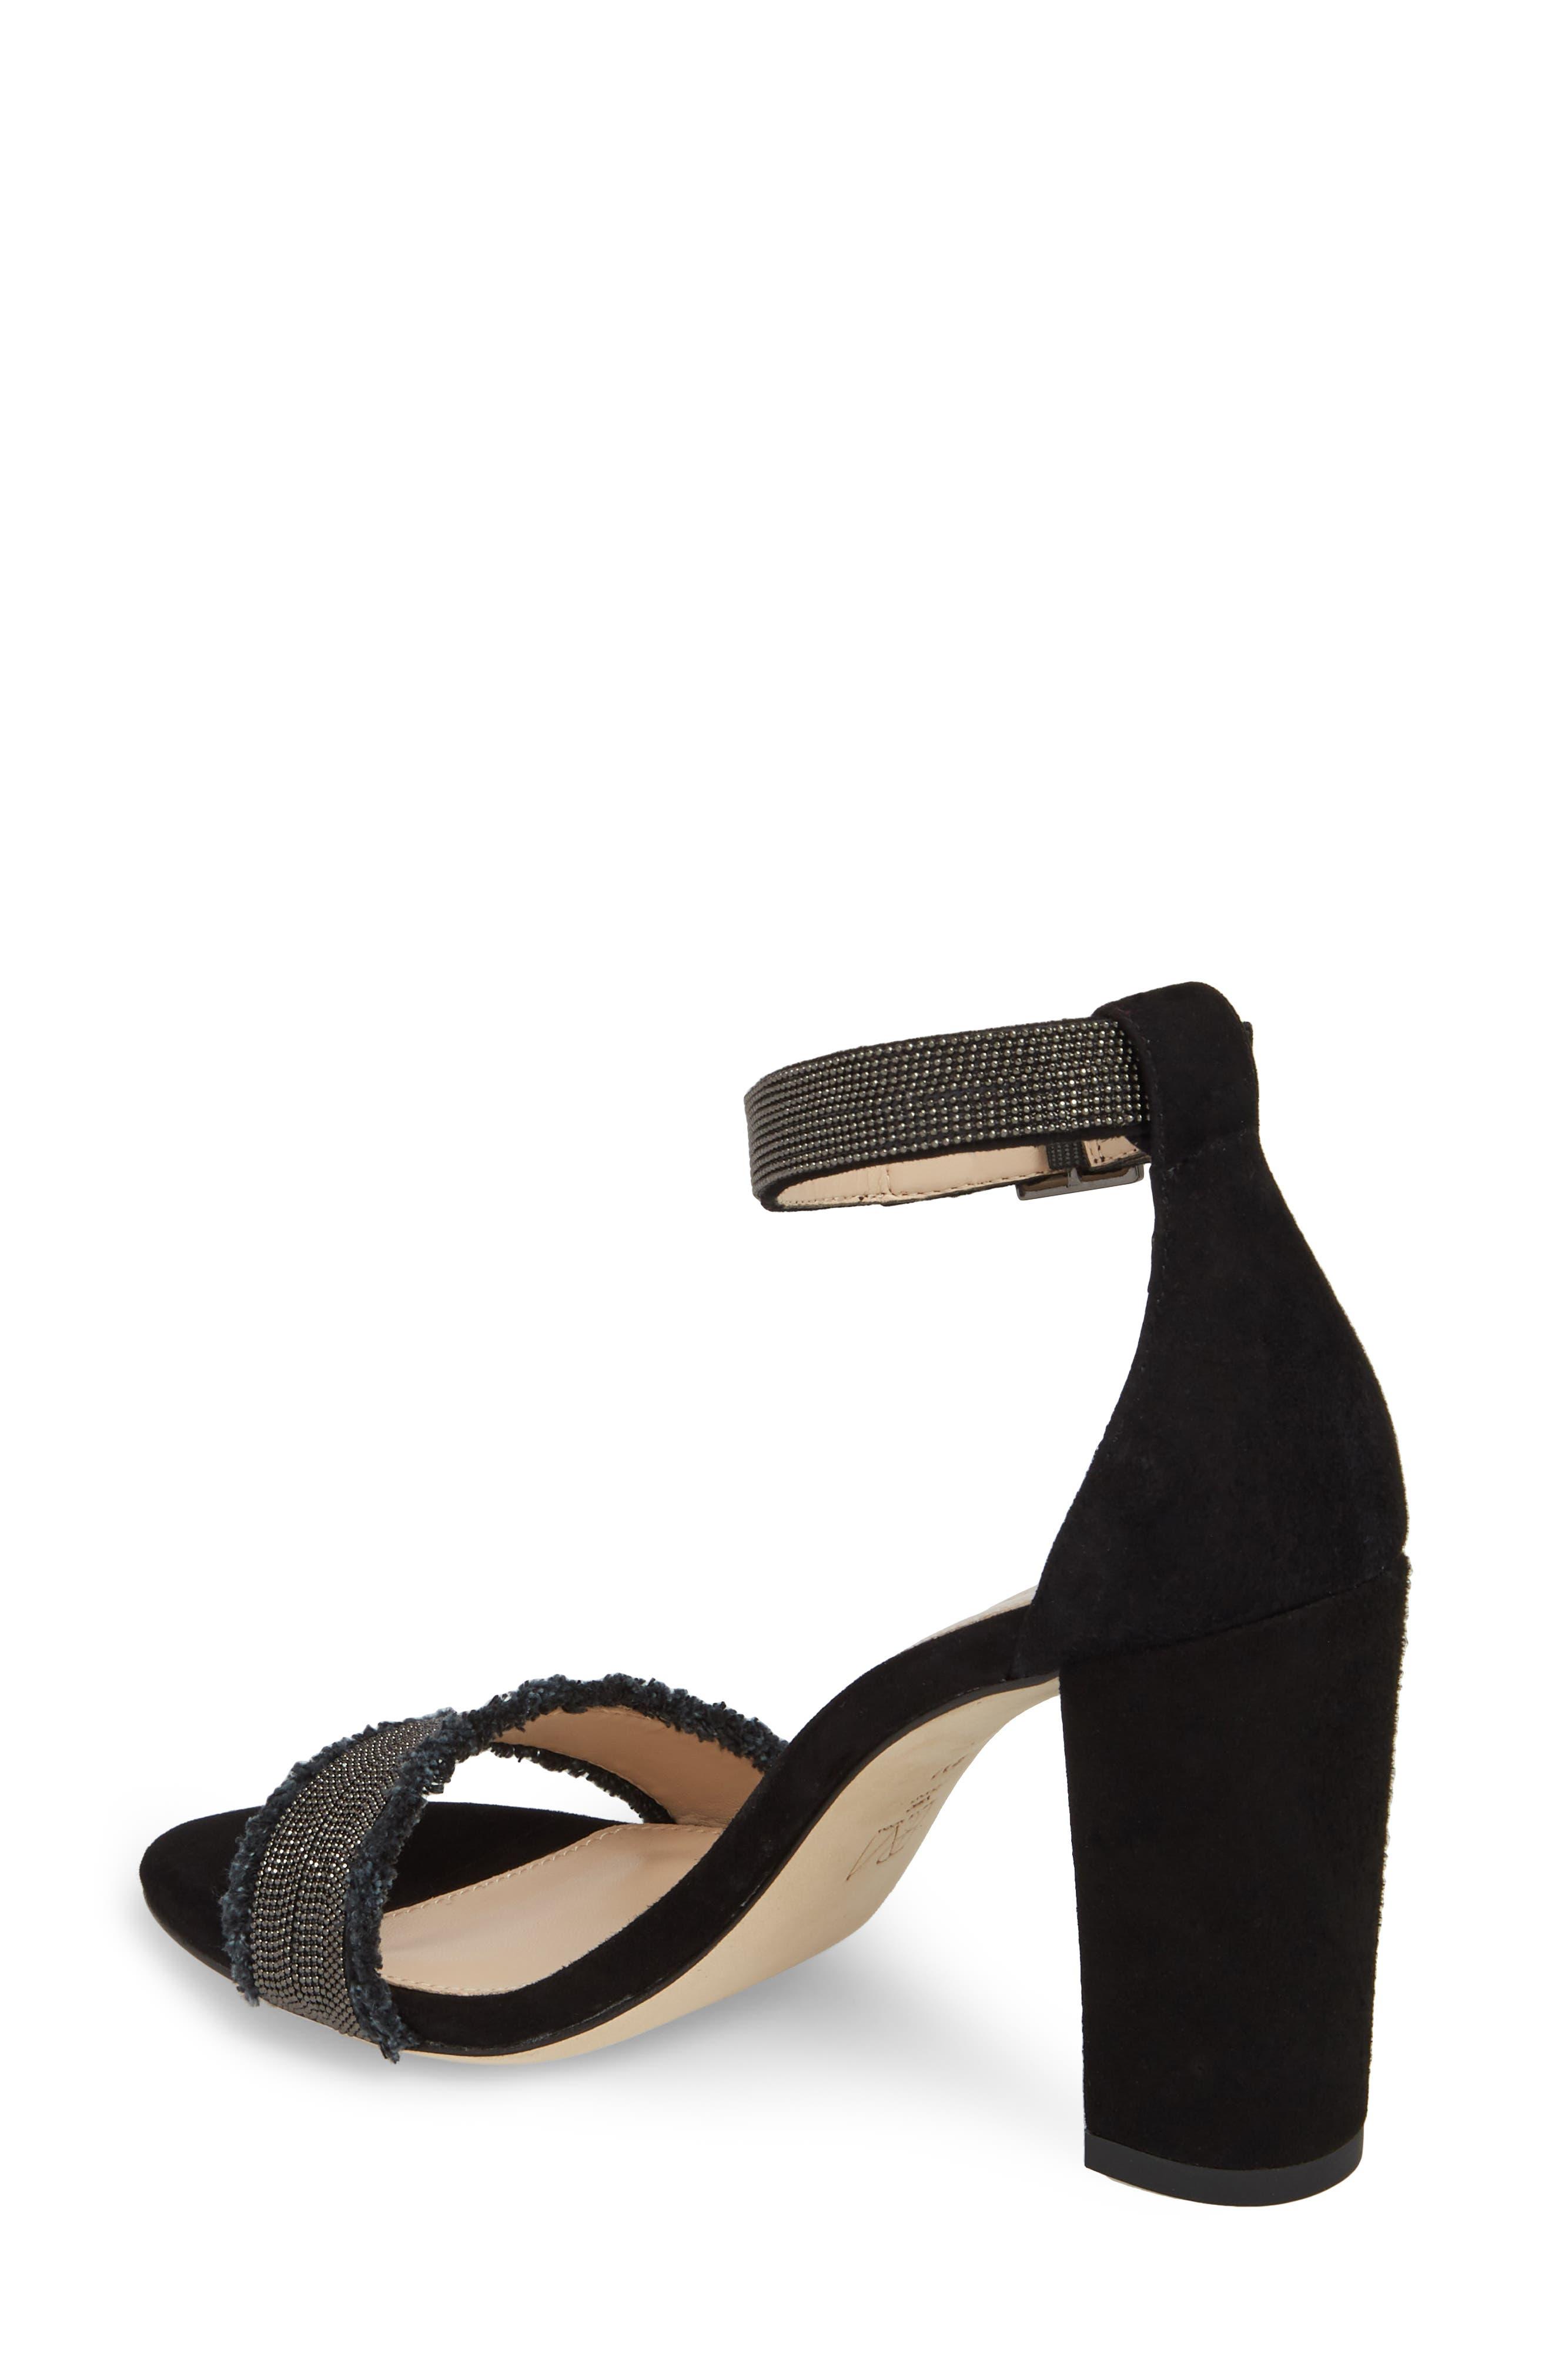 PELLE MODA,                             Bonnie6 Embellished Sandal,                             Alternate thumbnail 2, color,                             BLACK SUEDE